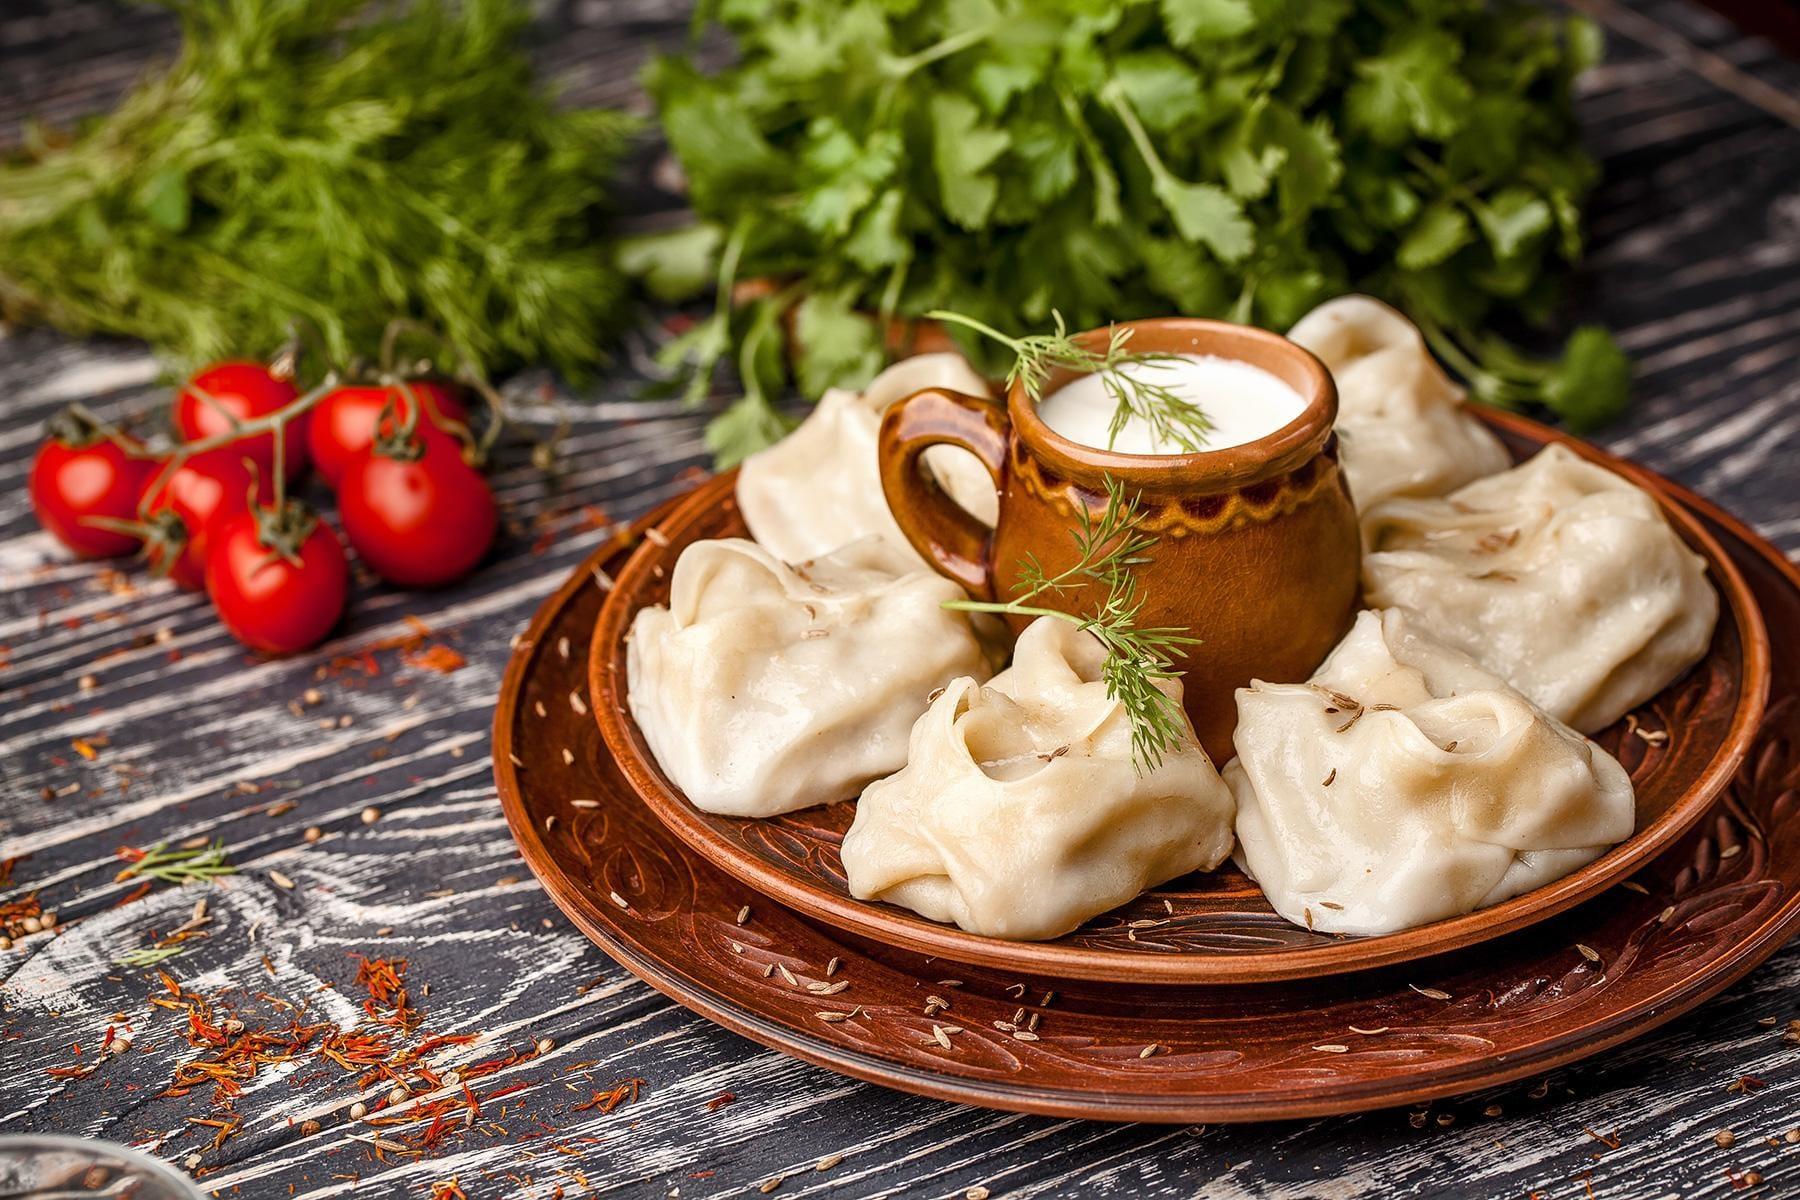 1_YervanArmenia_Restaurants_shutterstock_643002637_2